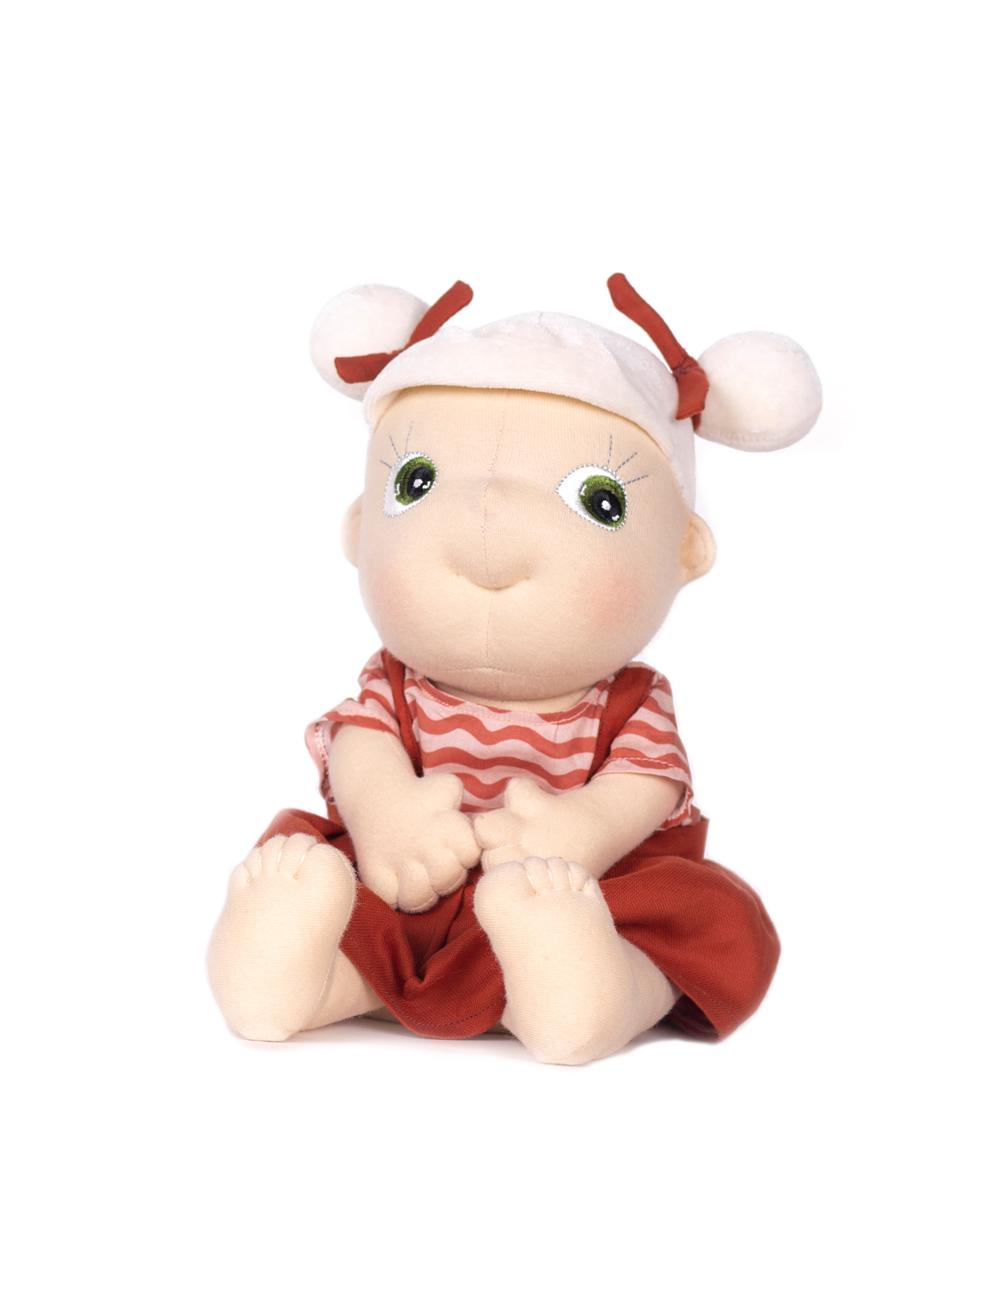 Sol Rubens Tummies Doll